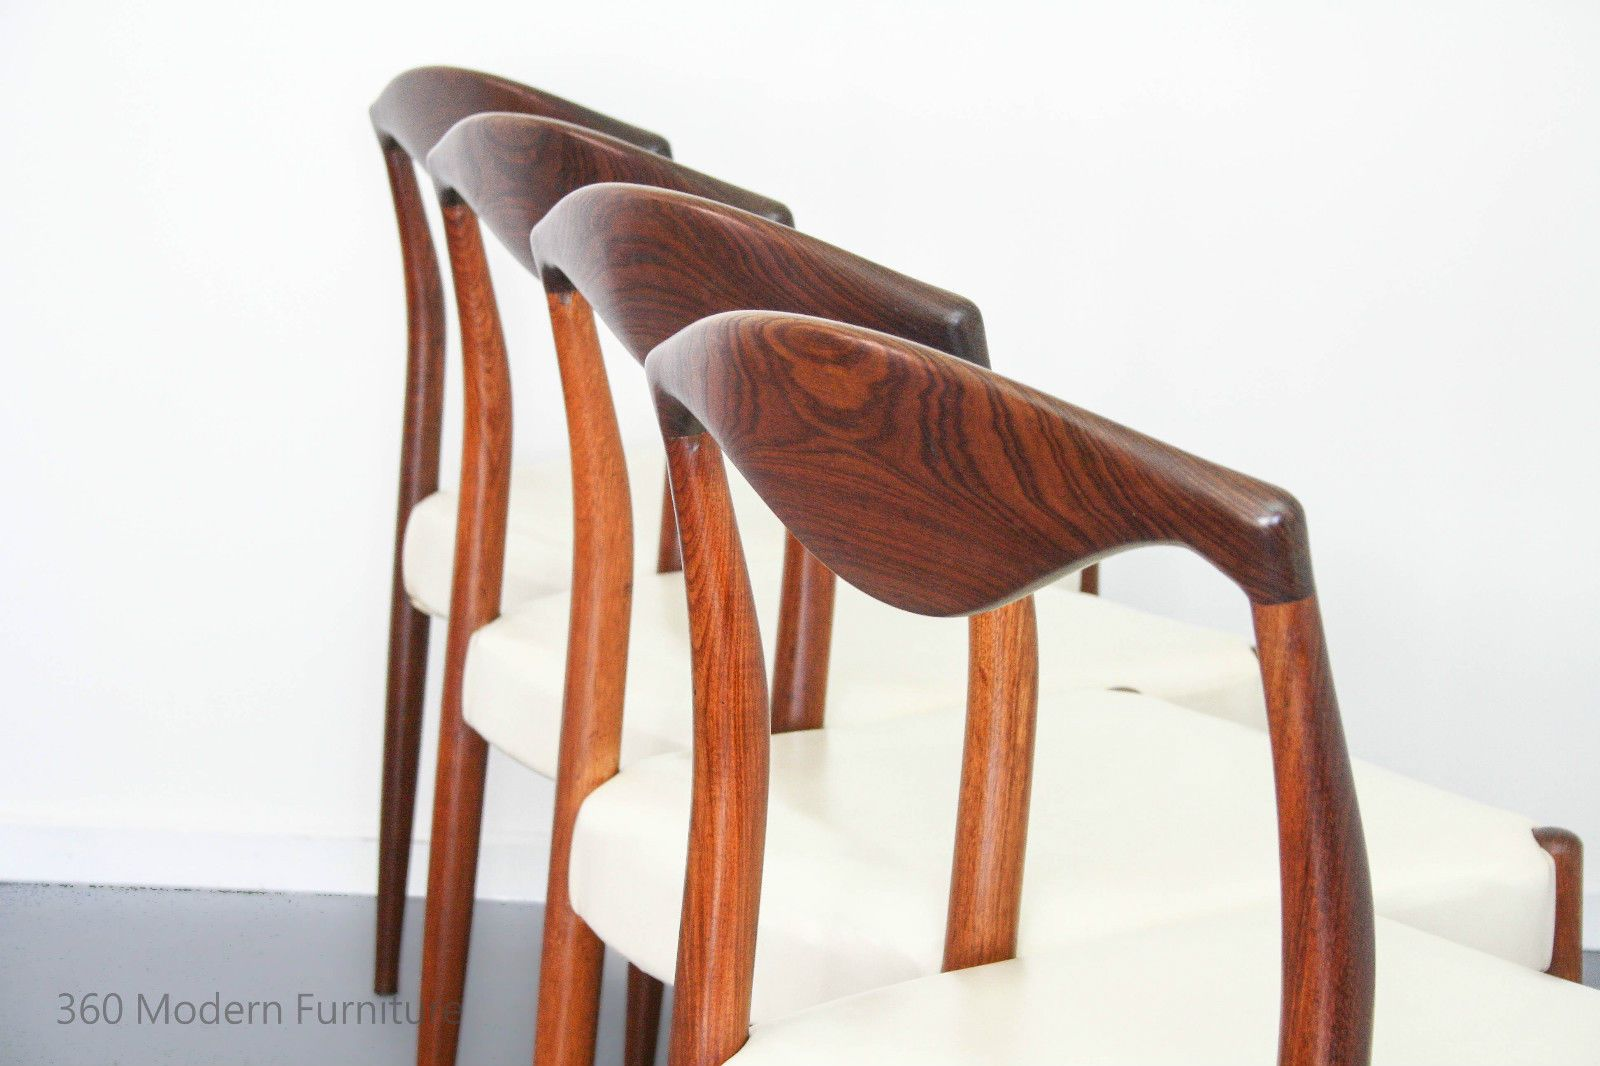 Fab RARE 4 Dining Chairs Spadeback Rosewood Vintage Retro